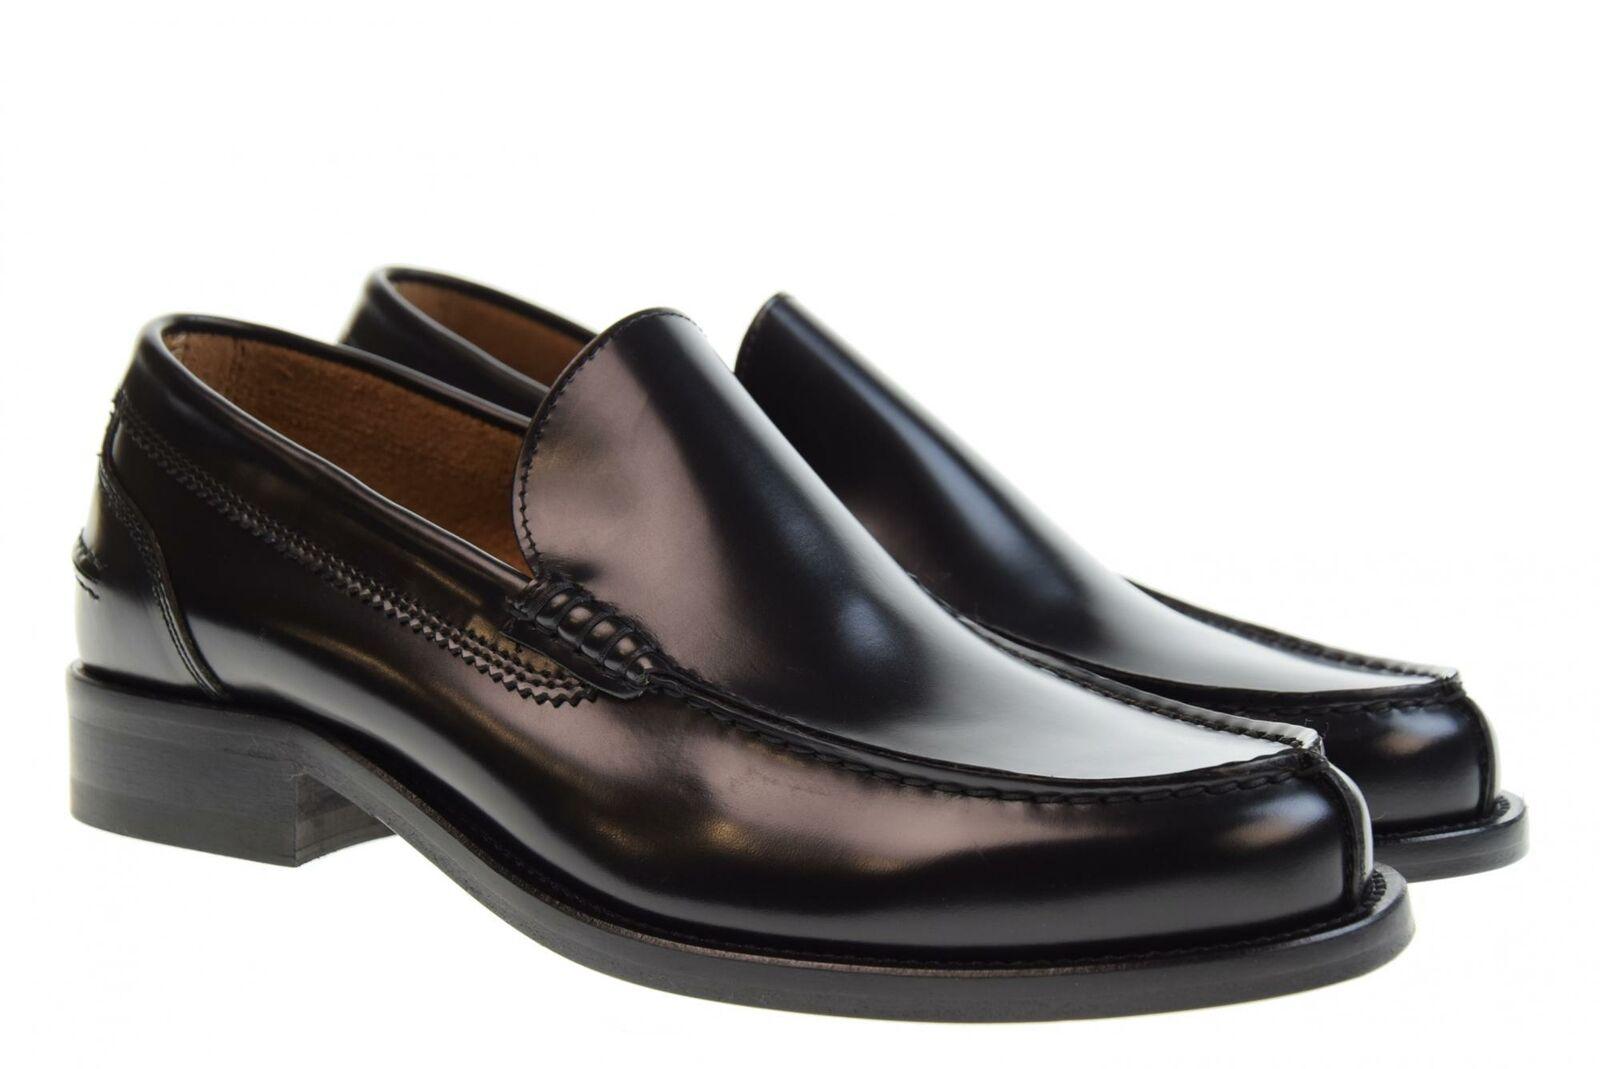 Antica Cuoieria P19u men's shoes moccasins 20775-G-G04 GLOSS black